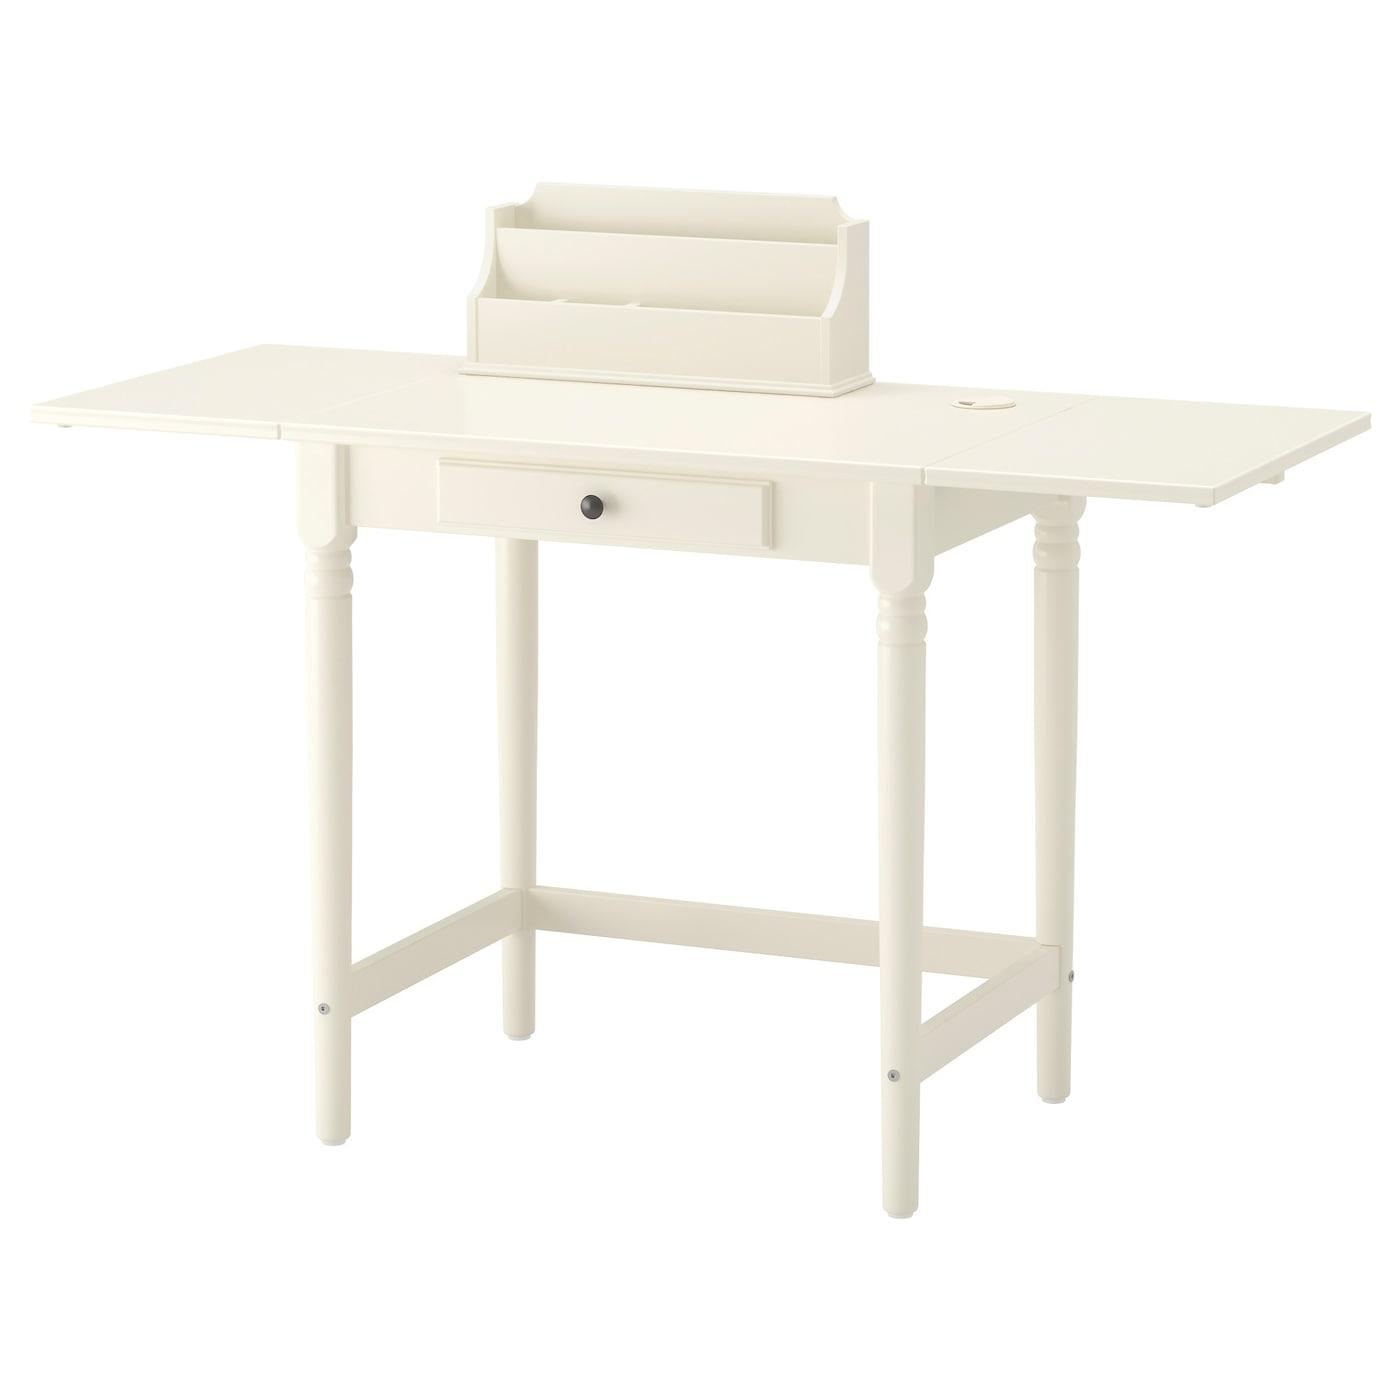 Ingatorp mesa blanco ikea - Ikea mesa blanca ...